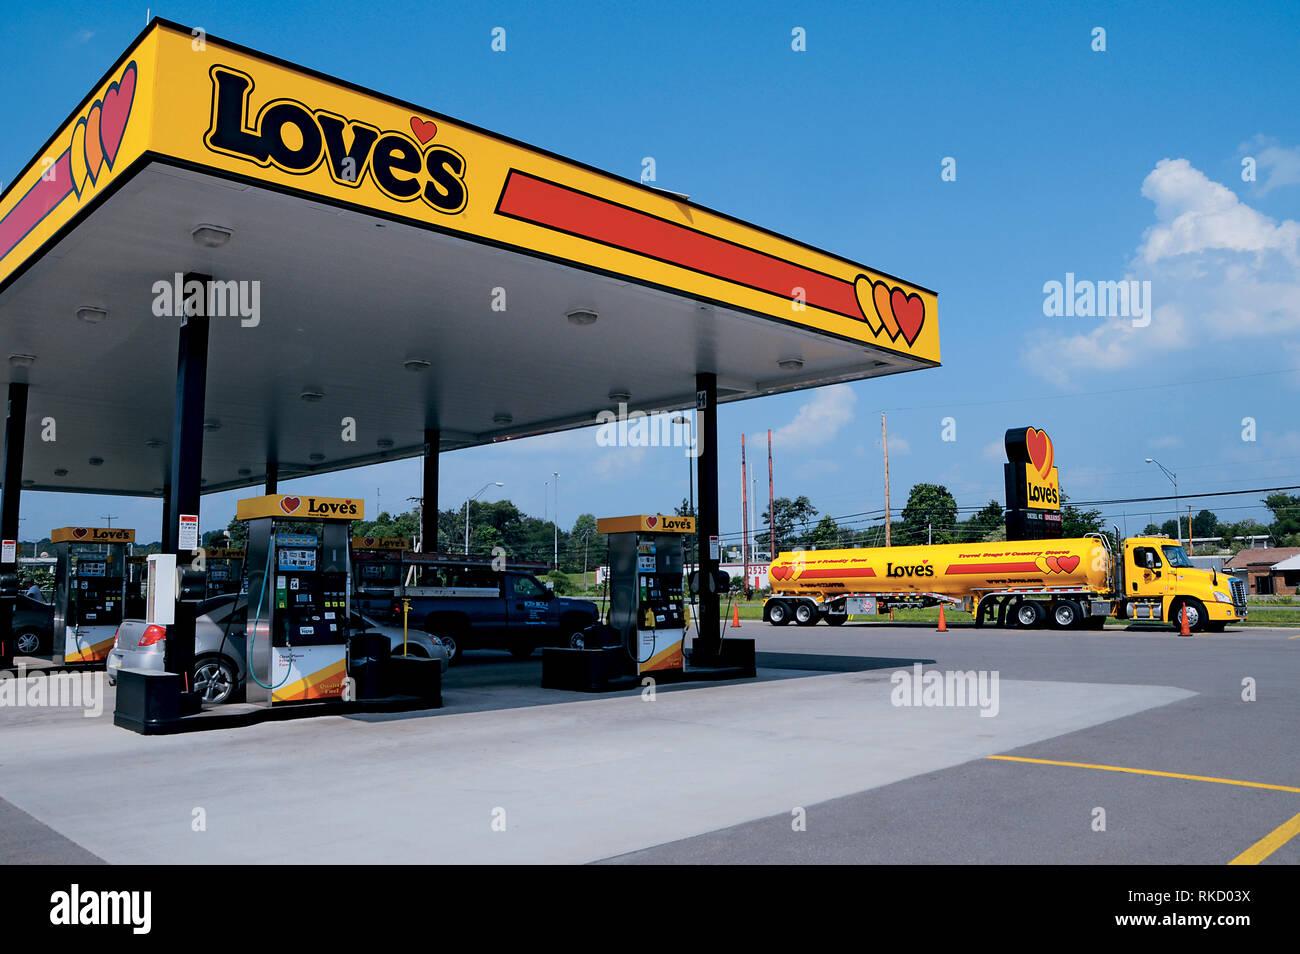 Love's Travel Stop - Stock Image